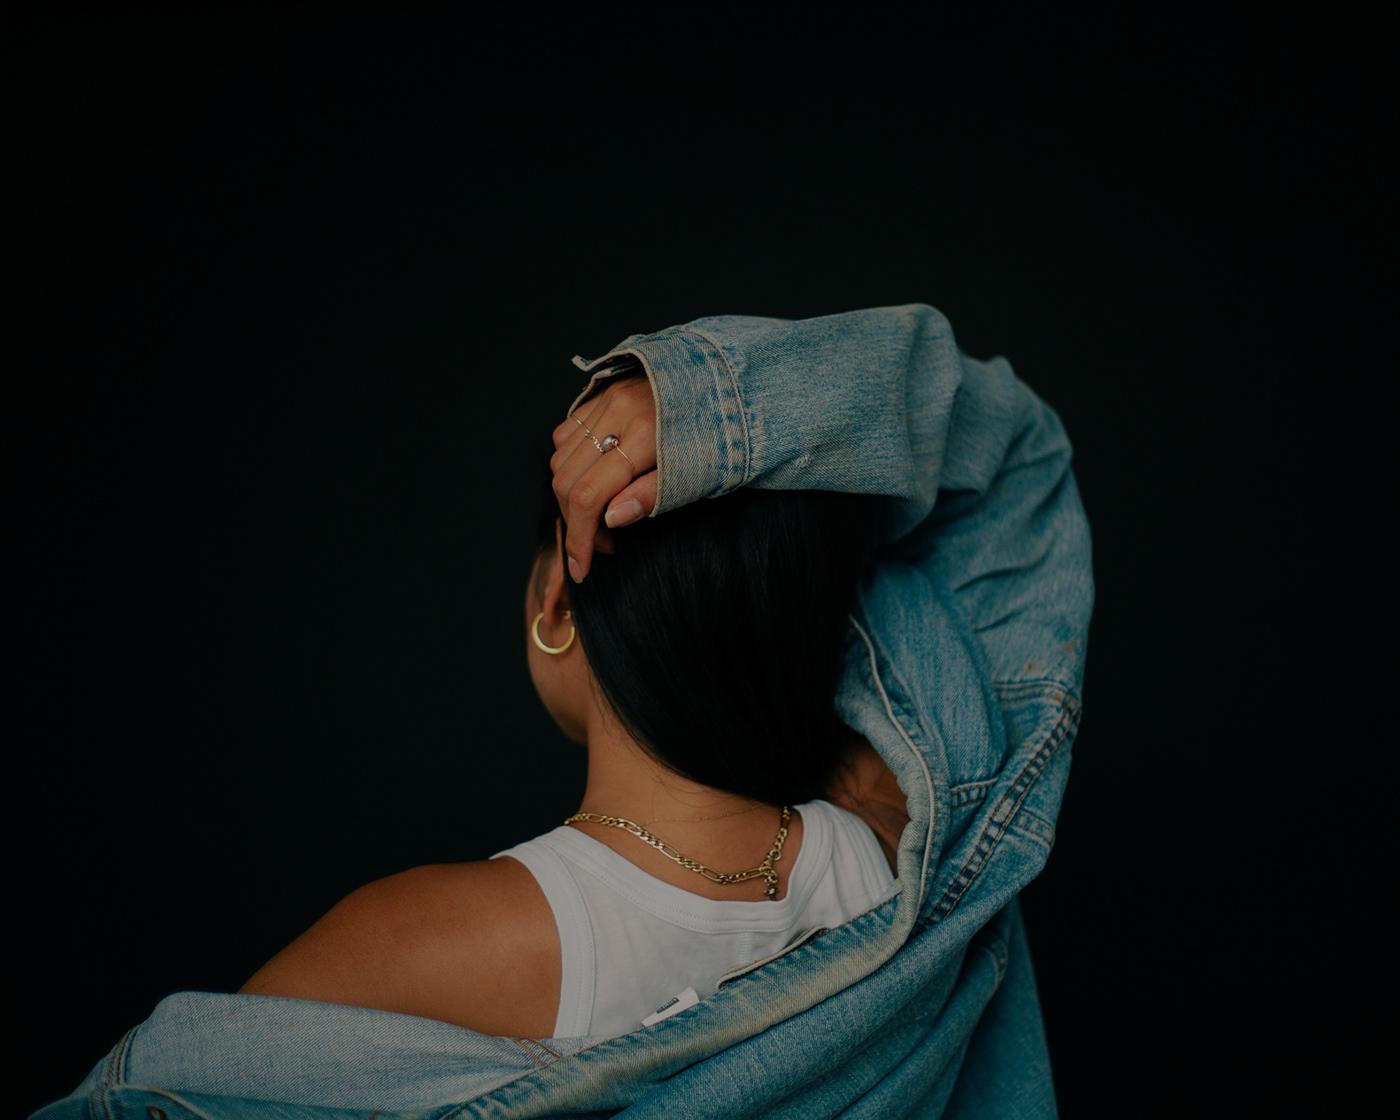 editorial photography emotion Emotional Female Model model studio Studio Photography